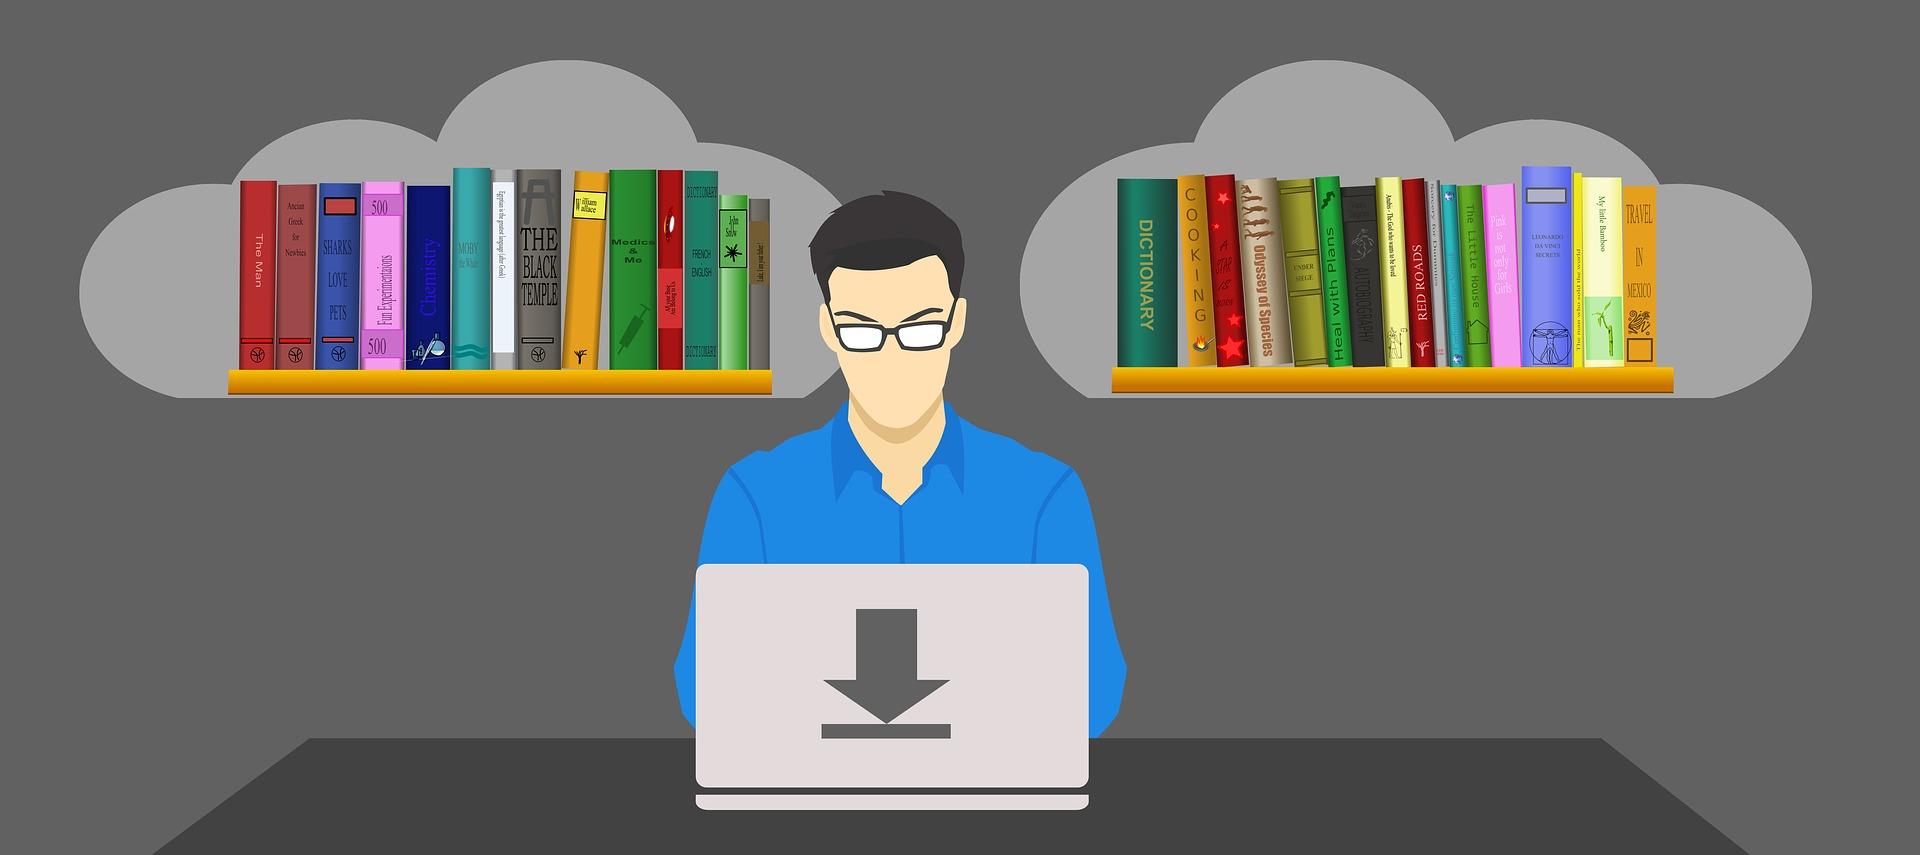 illustrations and ebooks